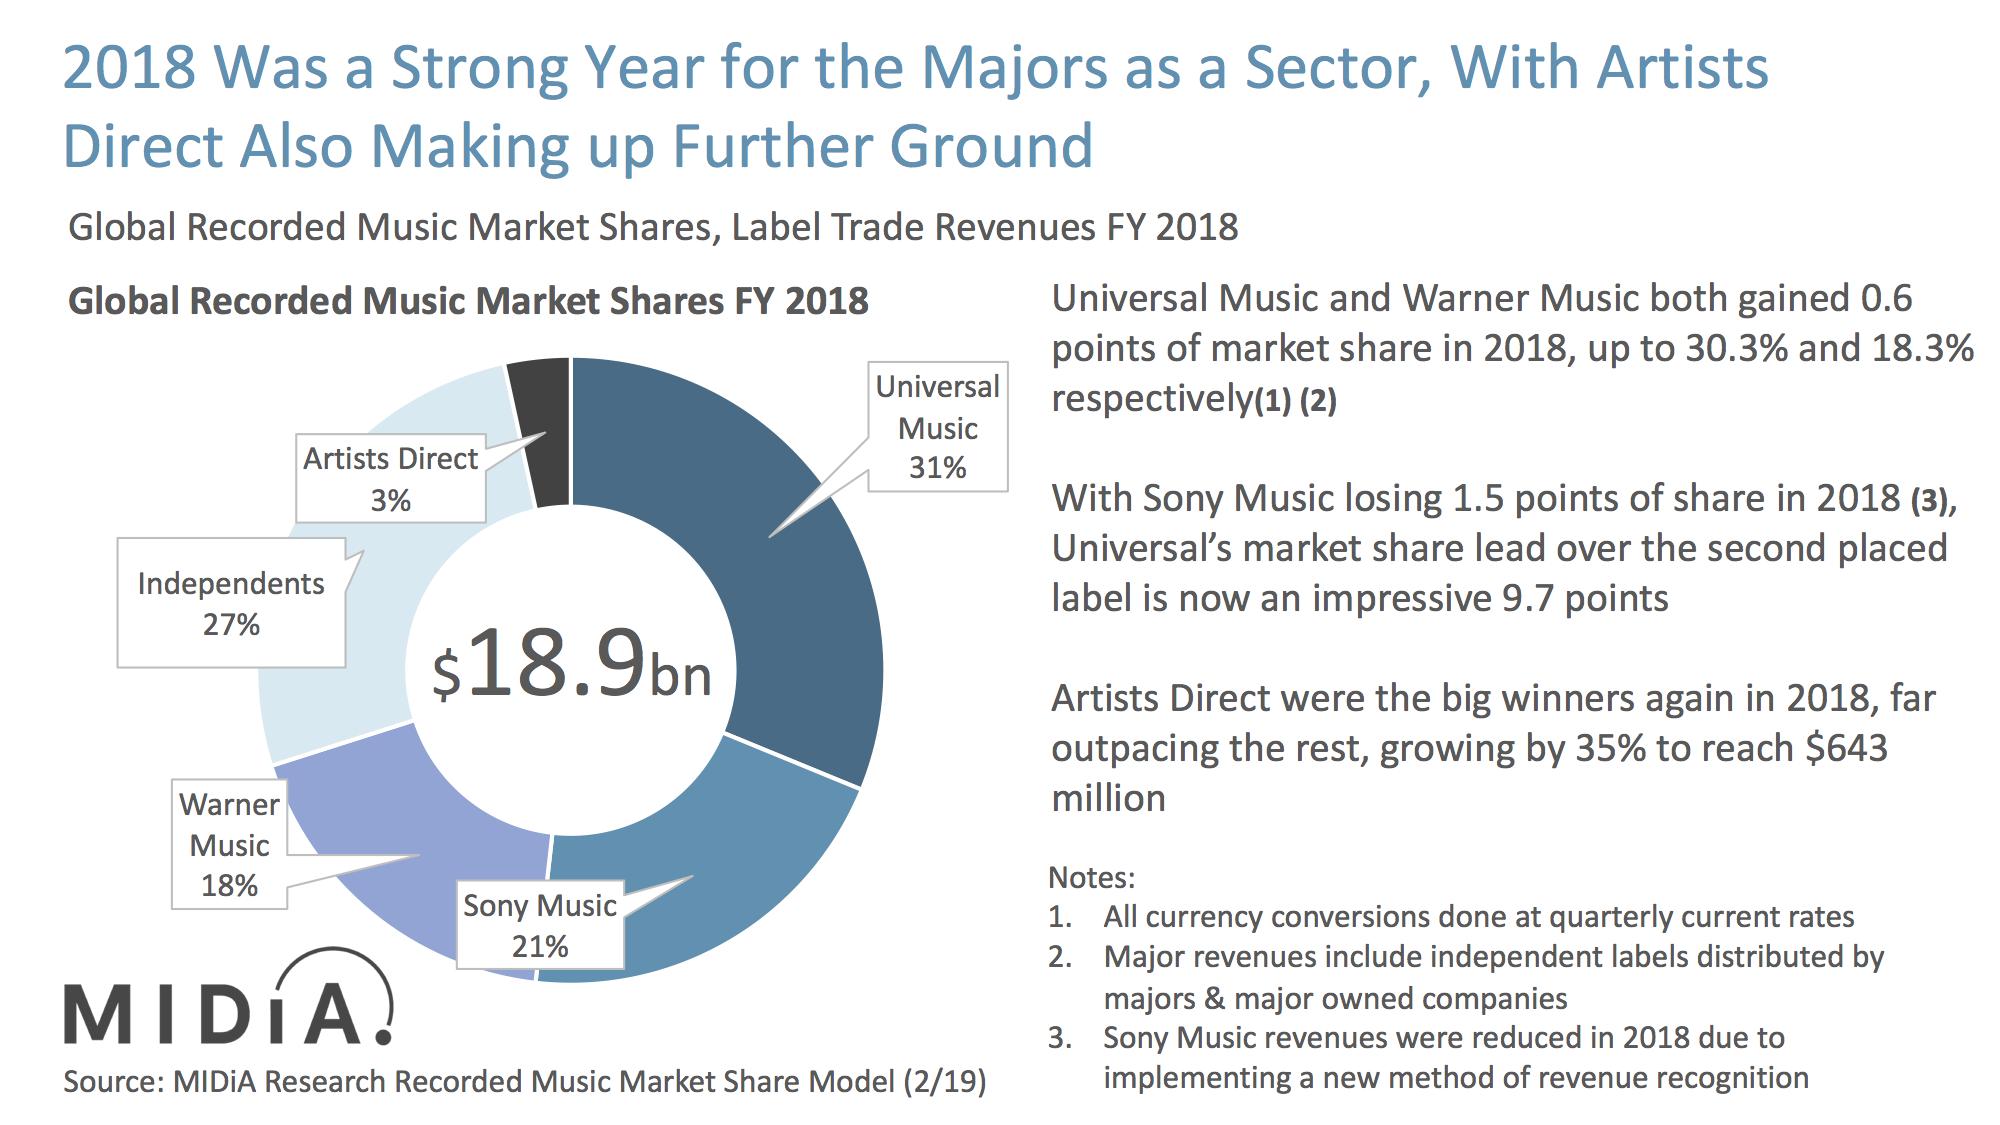 midia music market shares 2018